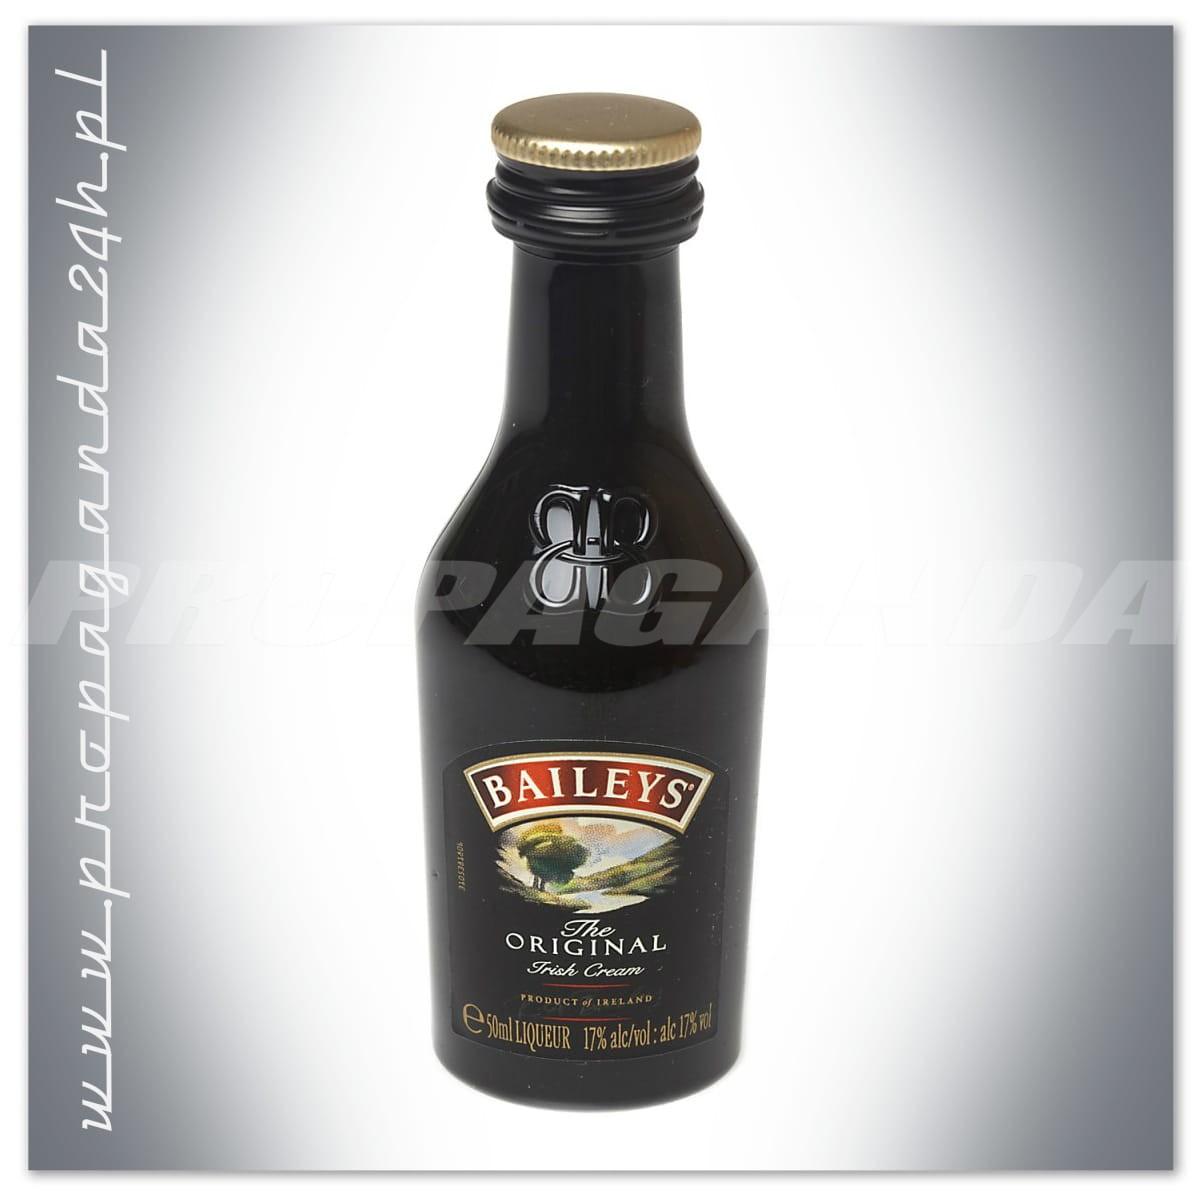 Flot BAILEYS THE ORIGINAL LIKIER IRISH CREAM 0,5L | LIKIERY & NALEWKI FQ-14